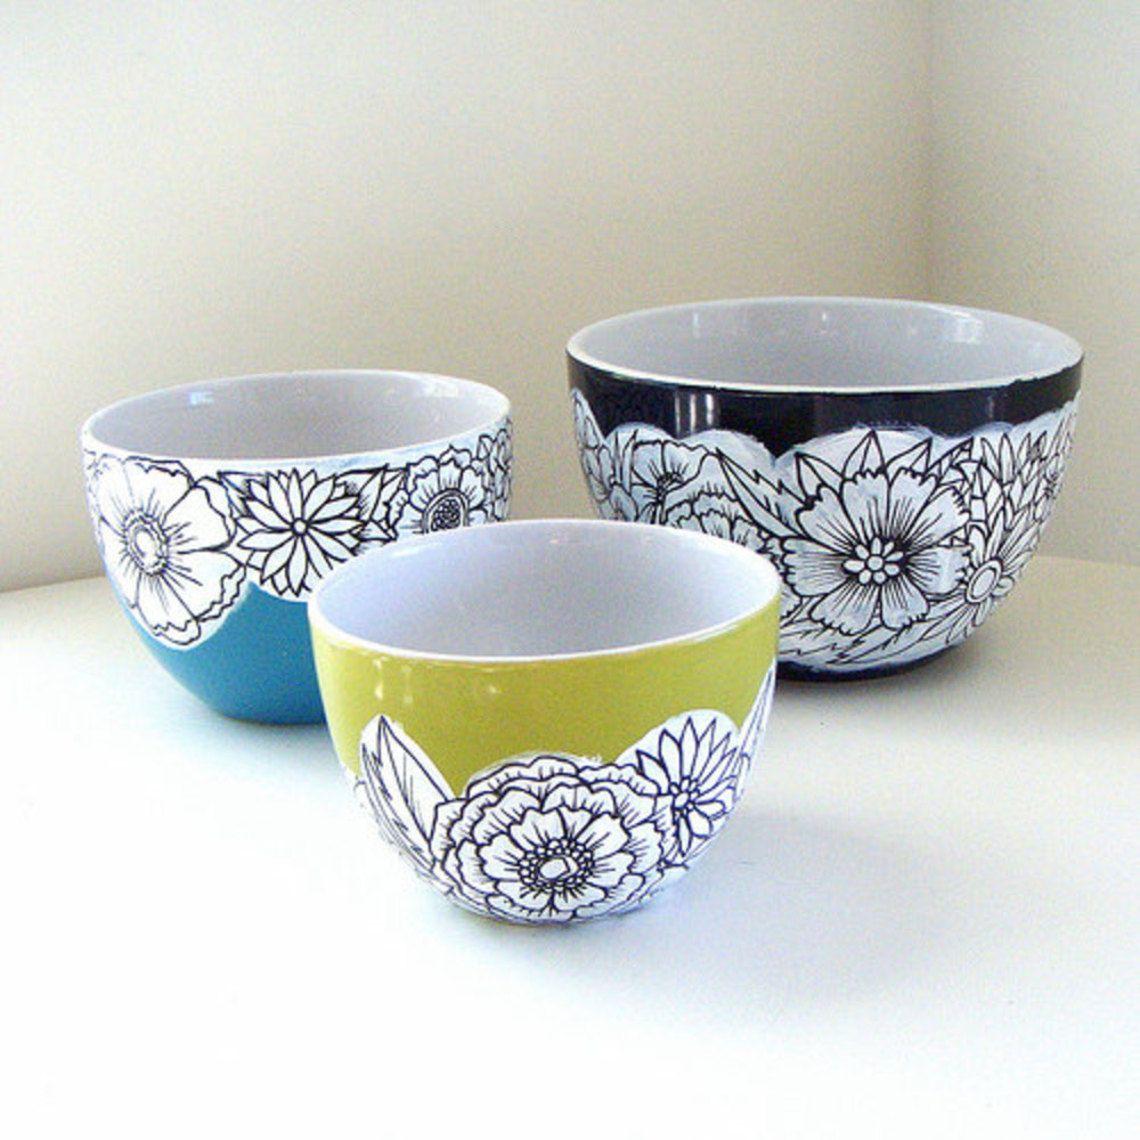 Ceramic Nesting Bowls Flowers Green Turquoise Black White Hand Painted Modern Folk Art Home Decor 120 0 Pottery Painting Designs Ceramic Pottery Ceramics